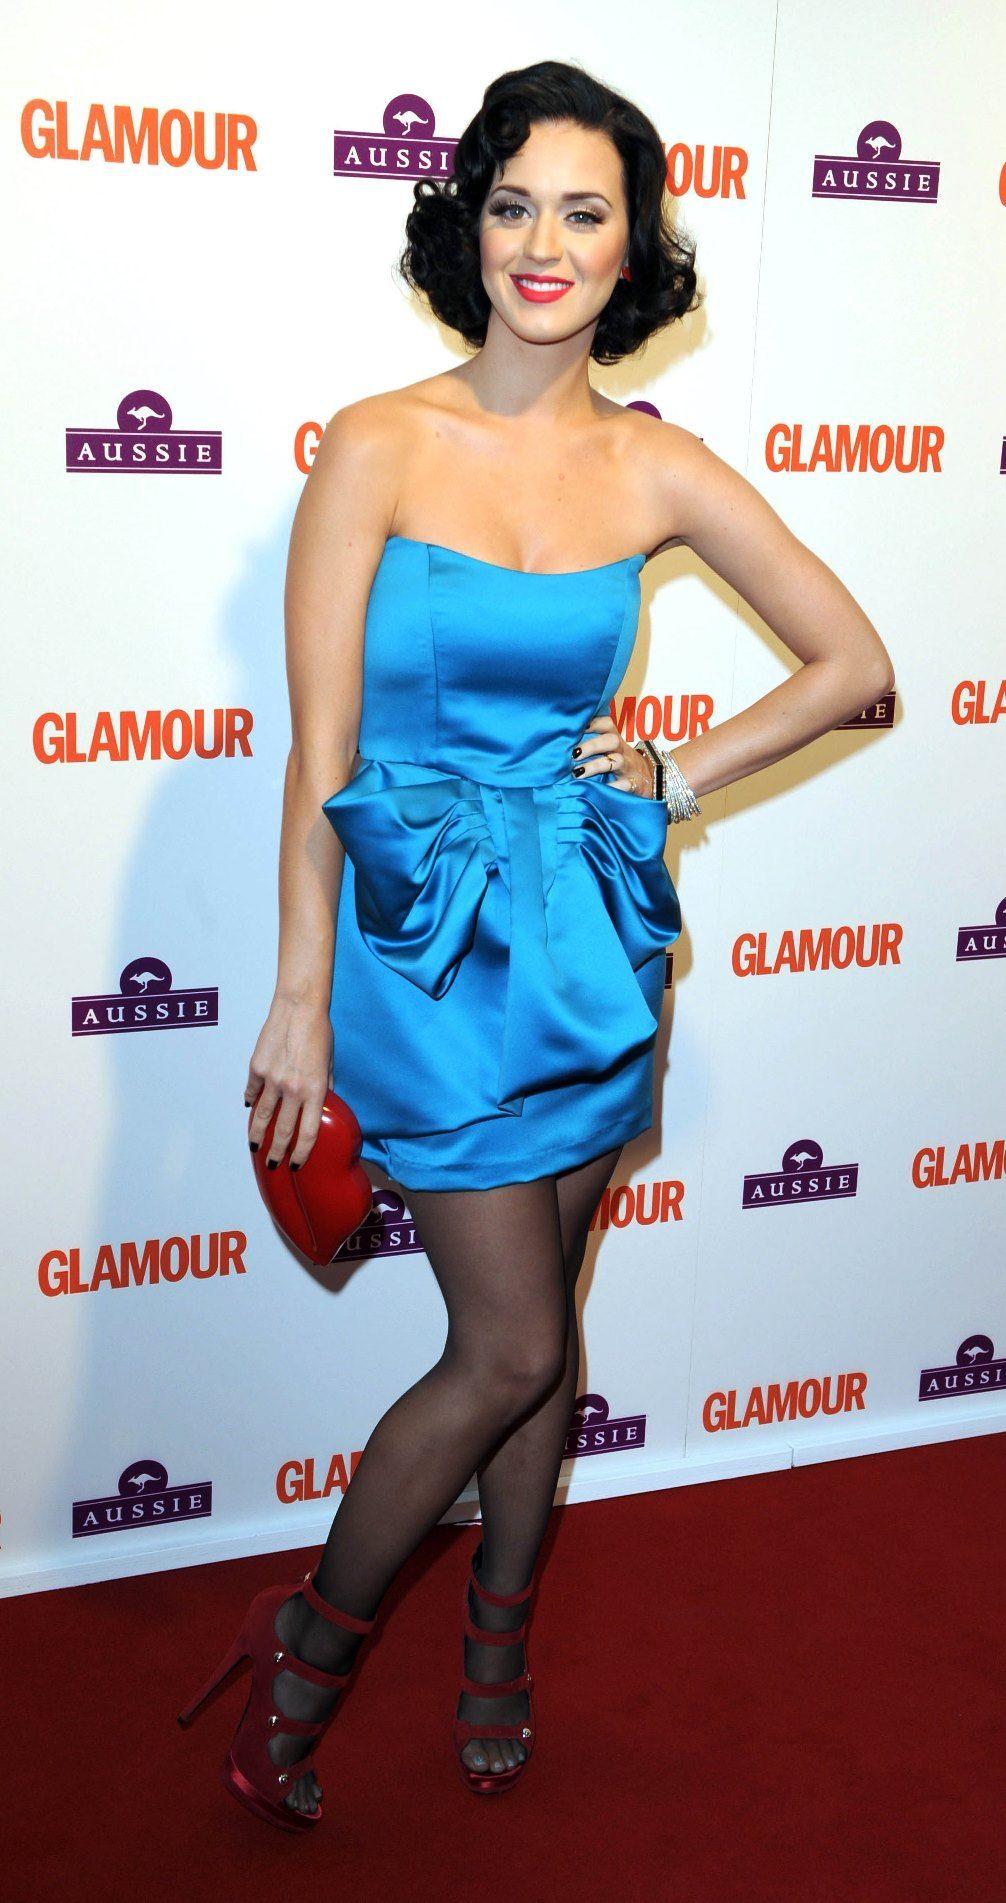 Blue apron elvis duran - Katy Perry